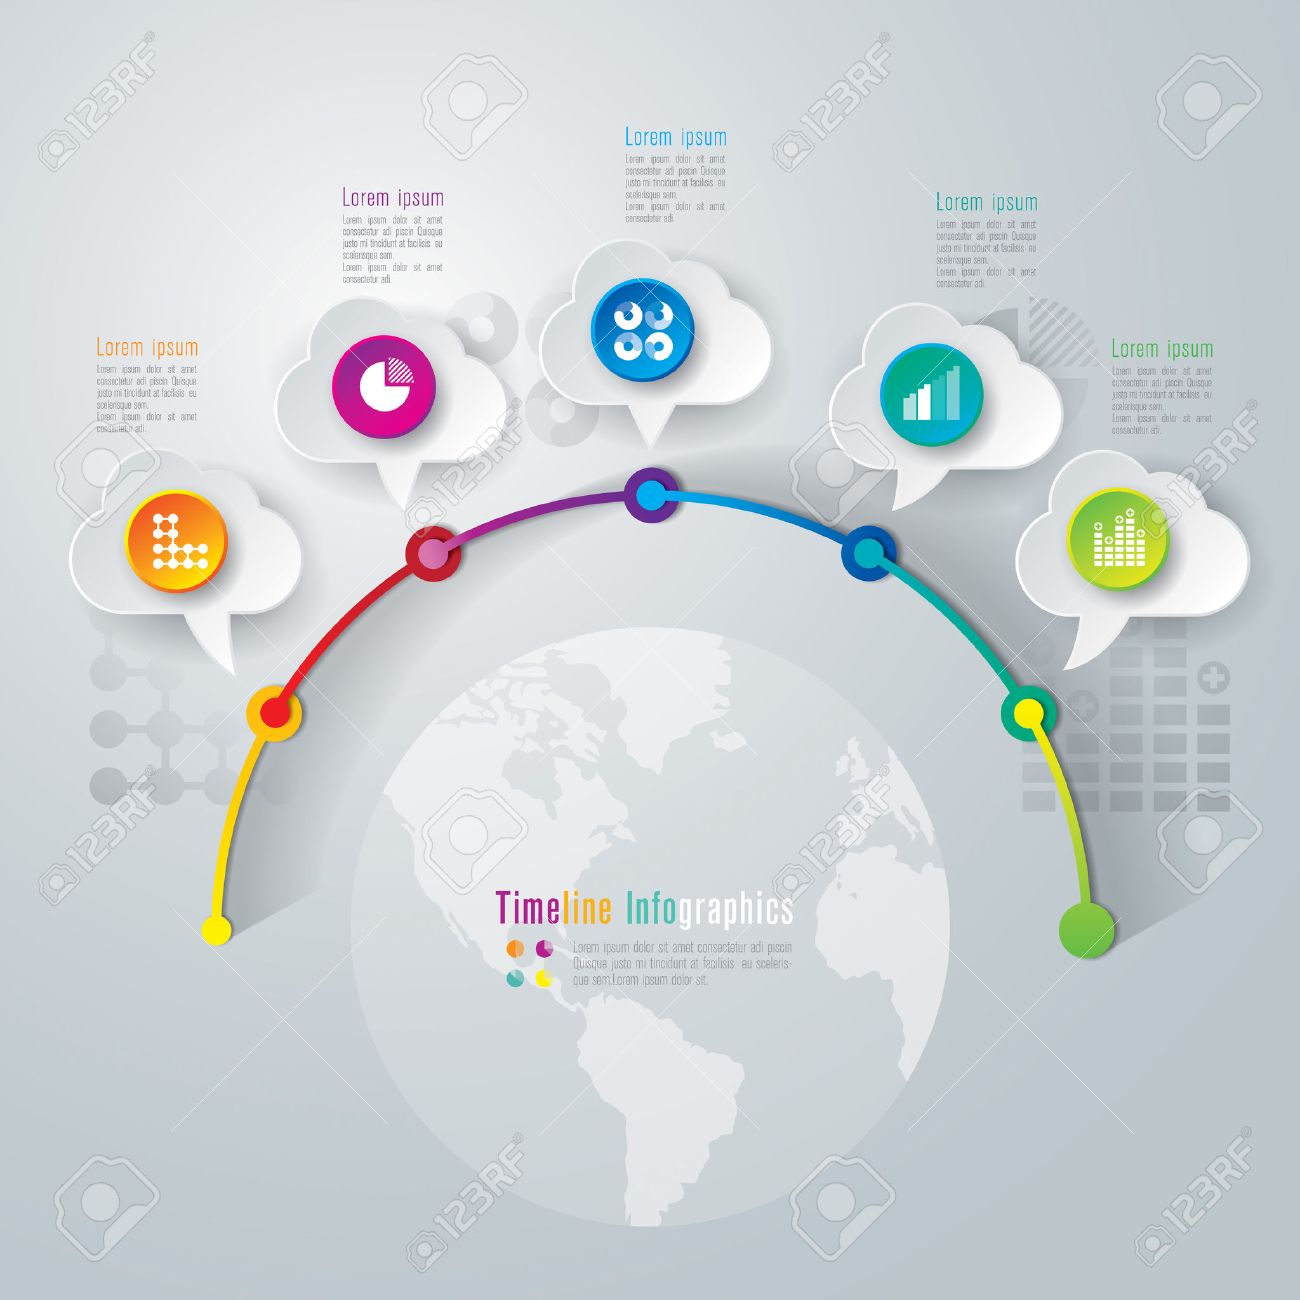 Timeline infographics design template Stock Vector - 26752652